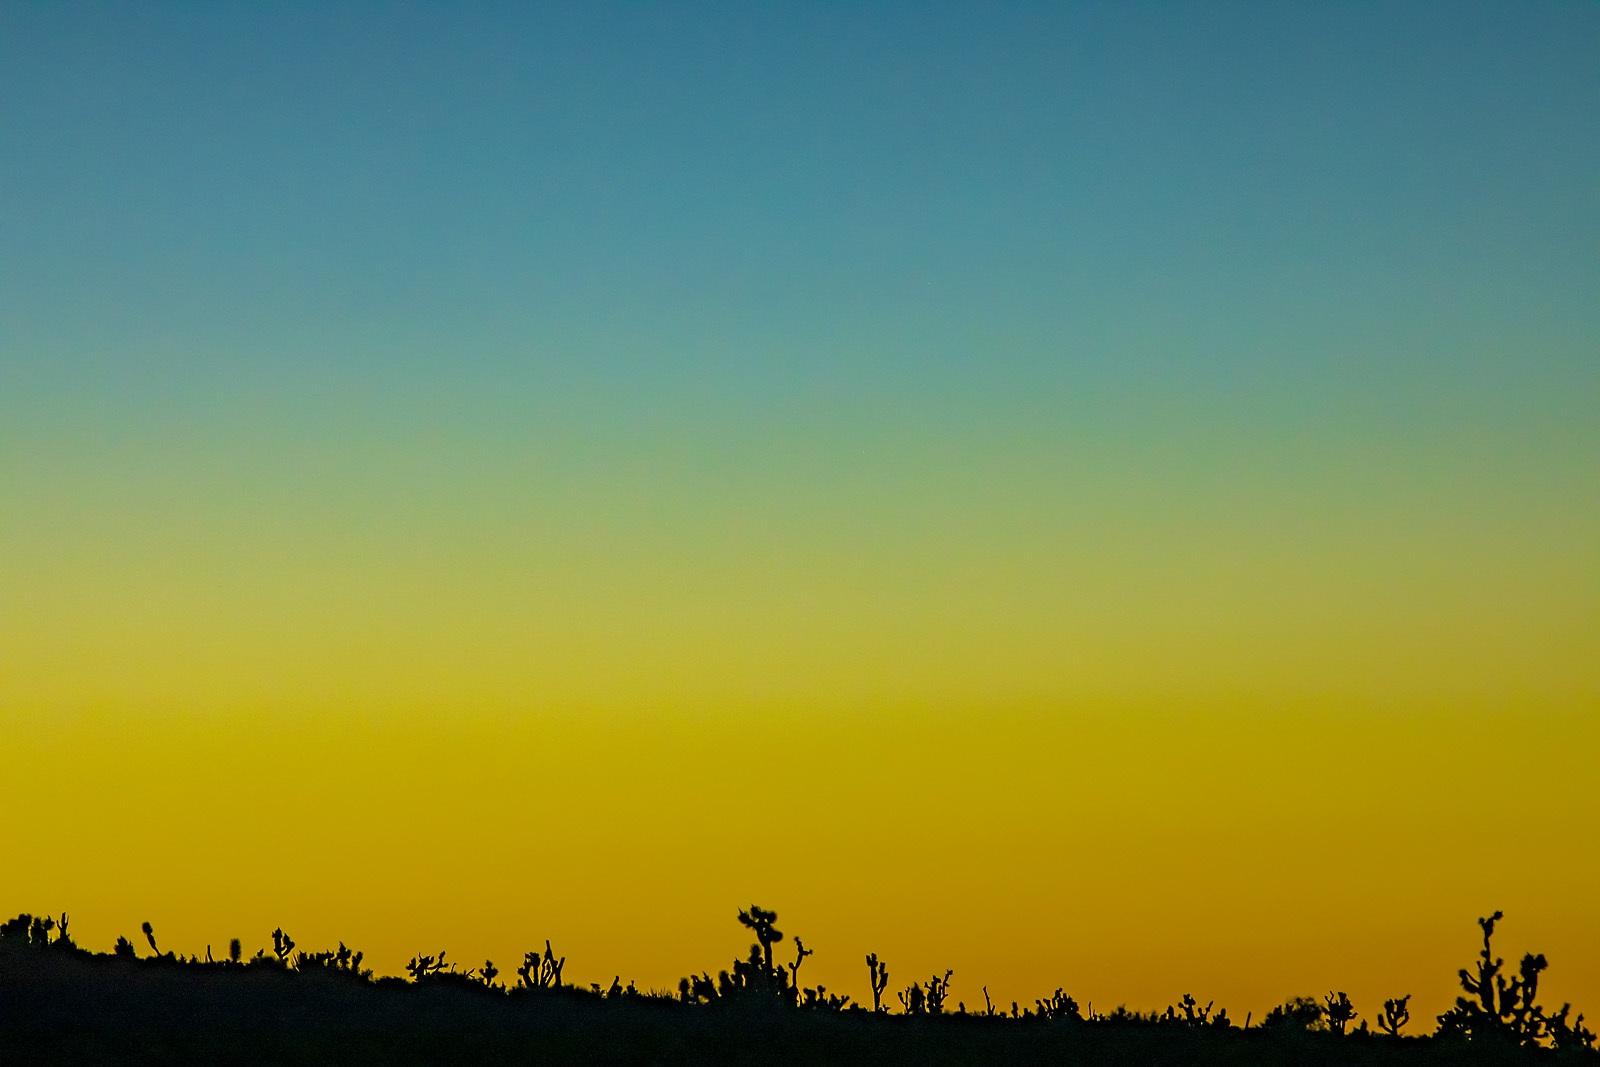 Nevada Scenic Landscape MG 4290 v1_ Vcnty Rte 156